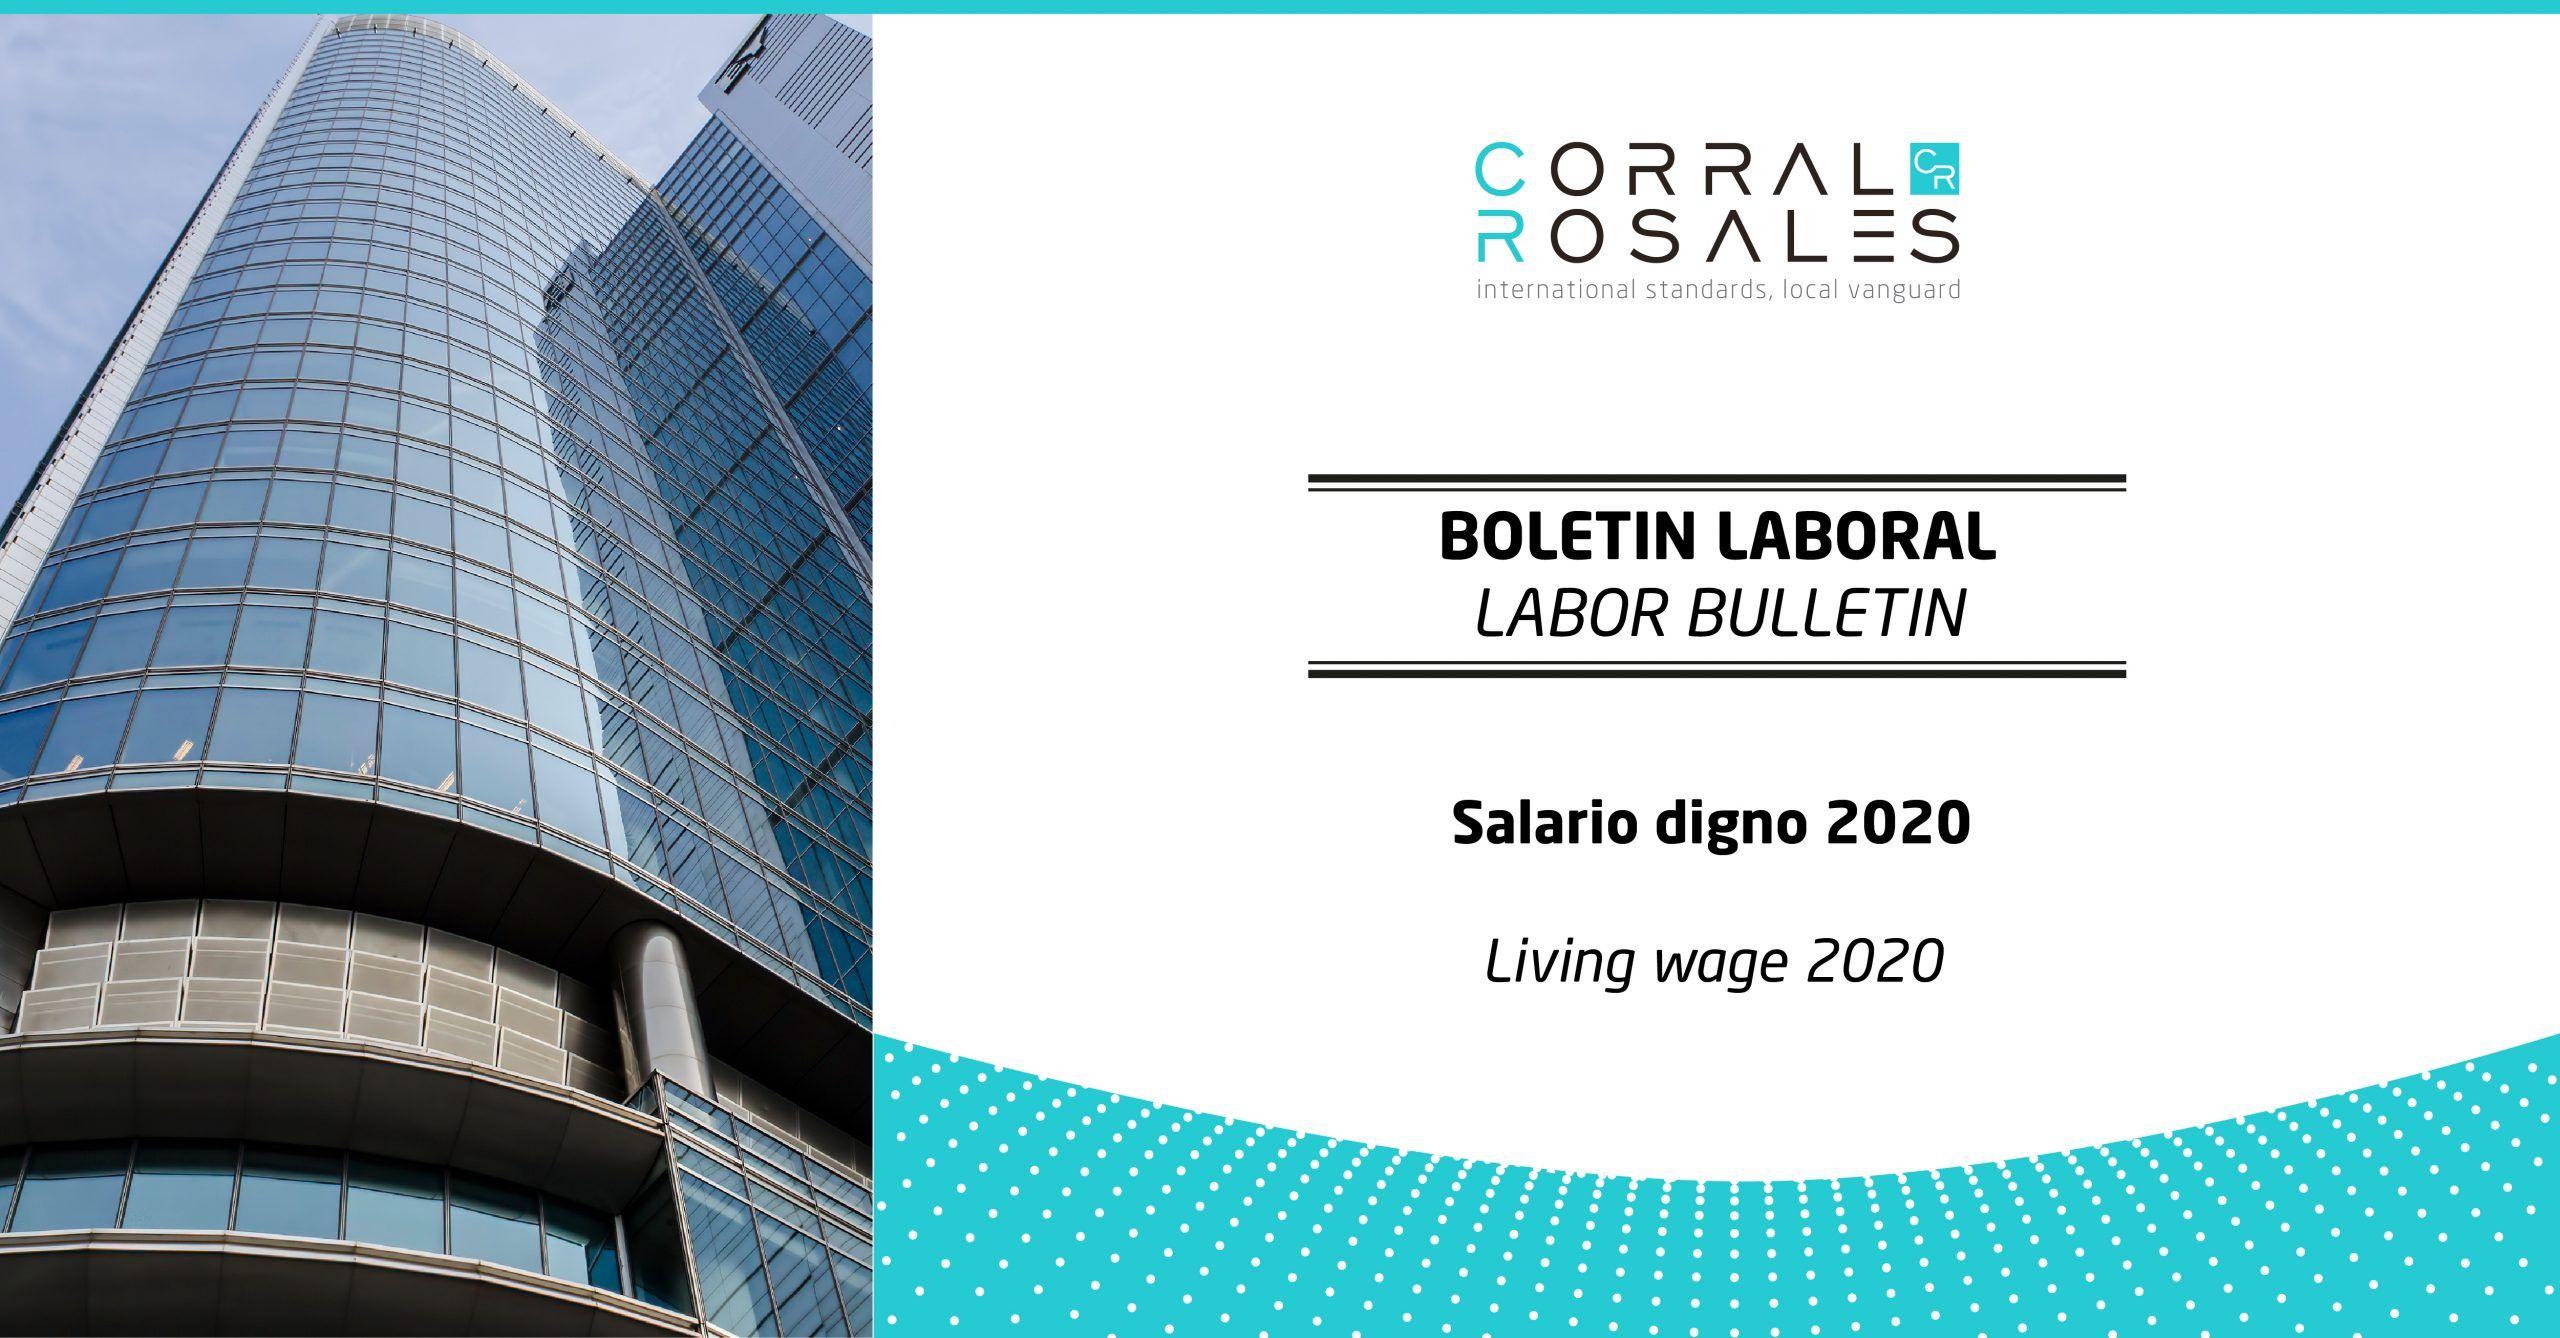 salario-digno-2020-corralrosales-abogados-ecuador